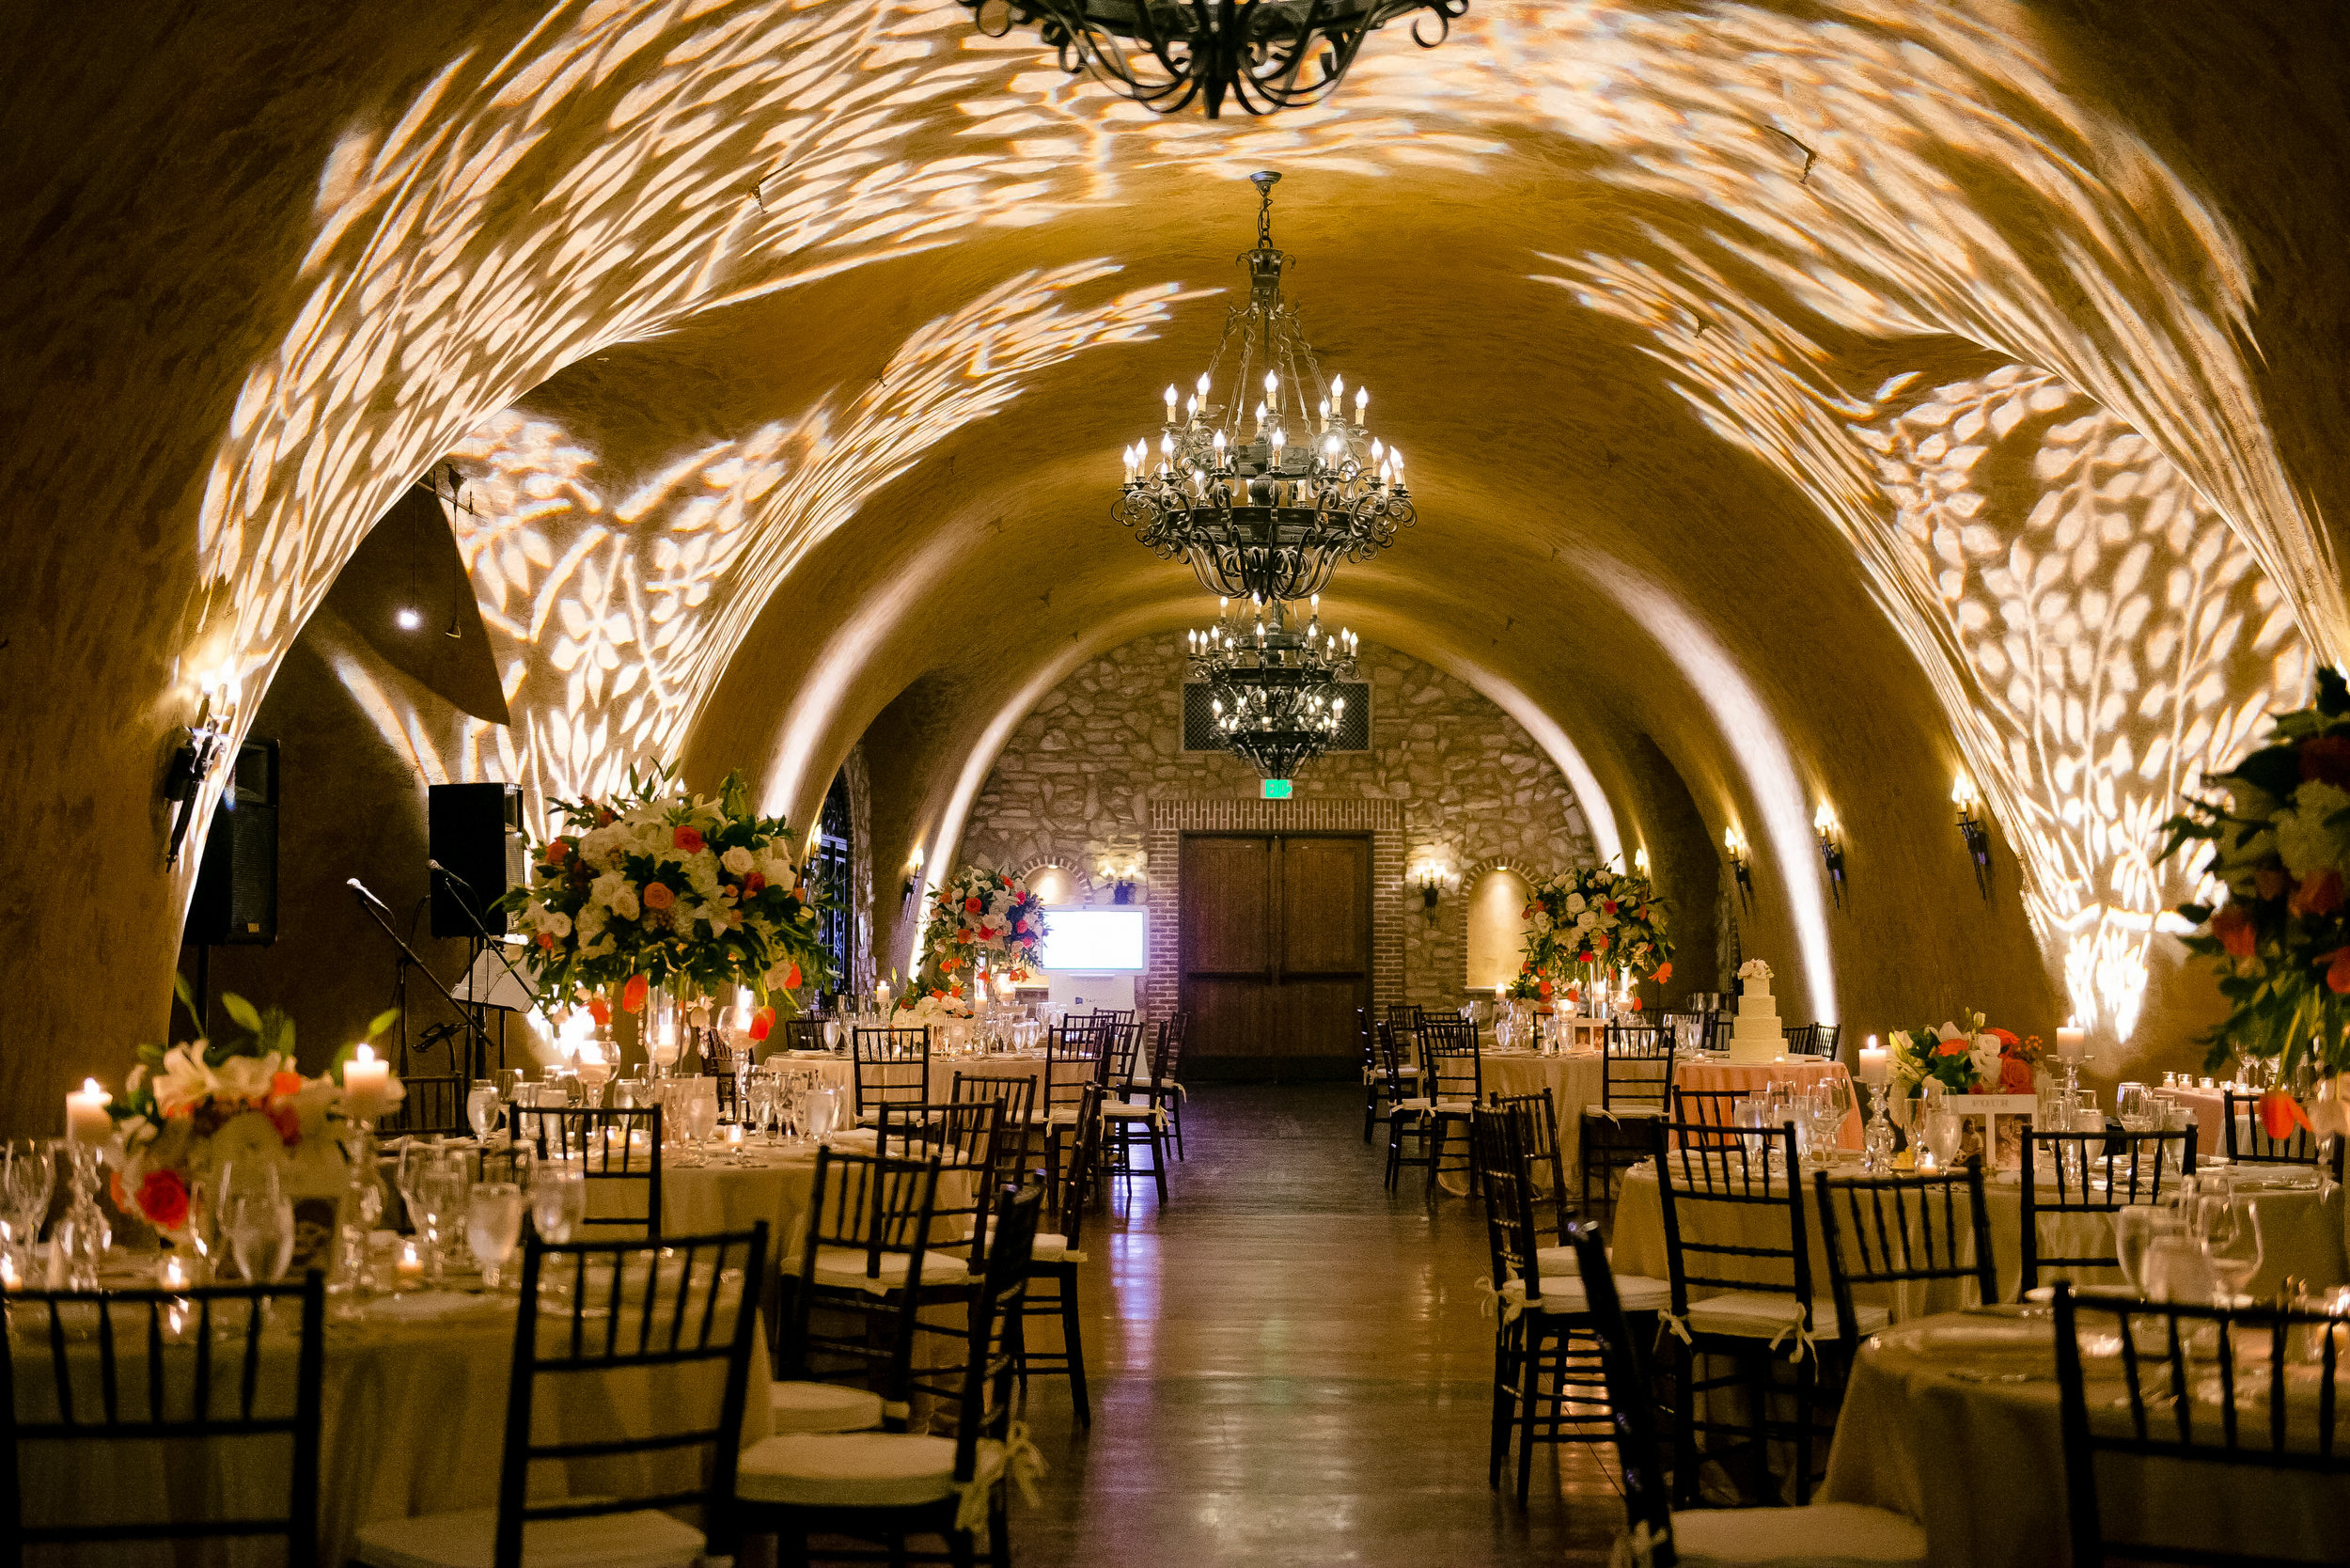 Uplighting with Gobo Patterns - Meritage Wine Cave.jpg